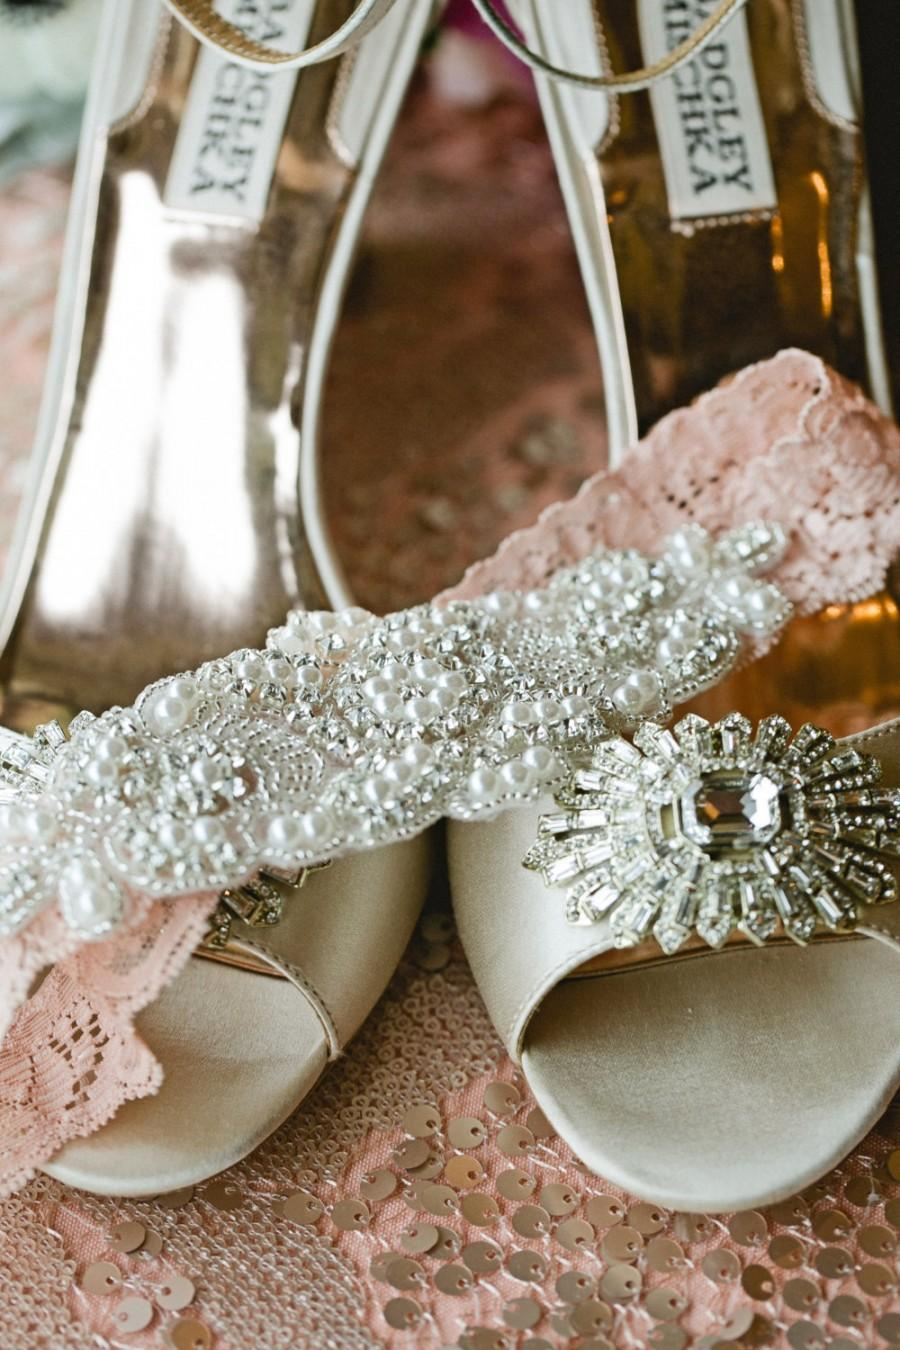 Mariage - ELISABETH - Peach Garter - Wedding Lace Garter - Individual Or Set - Ivory/White/Peach Lace Garter -Rhinestone Wedding Garter - Trow Garter